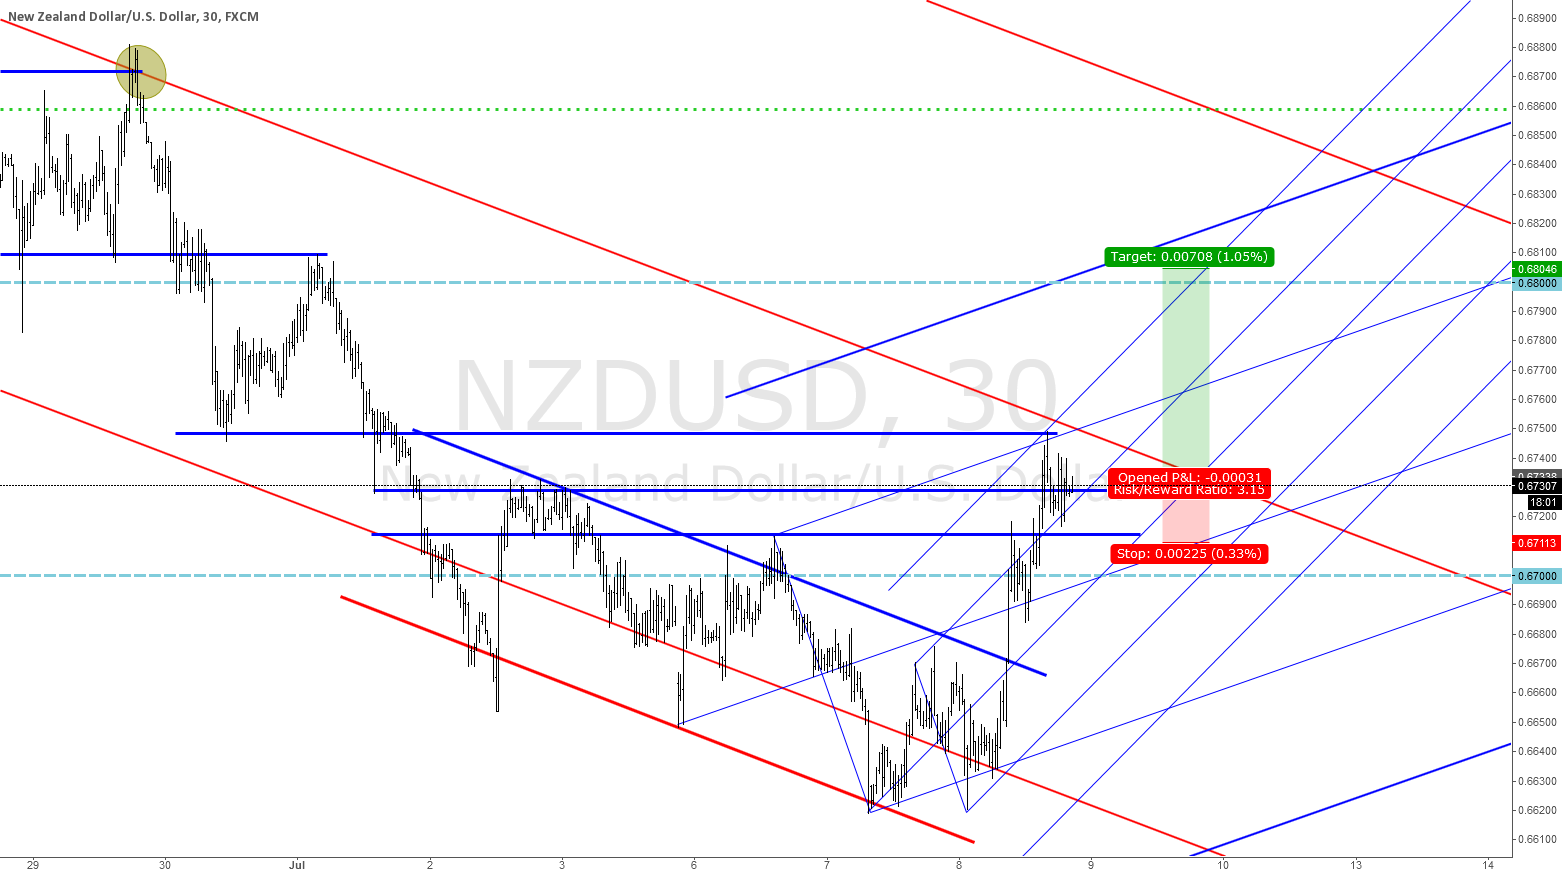 NZD/USD LONG